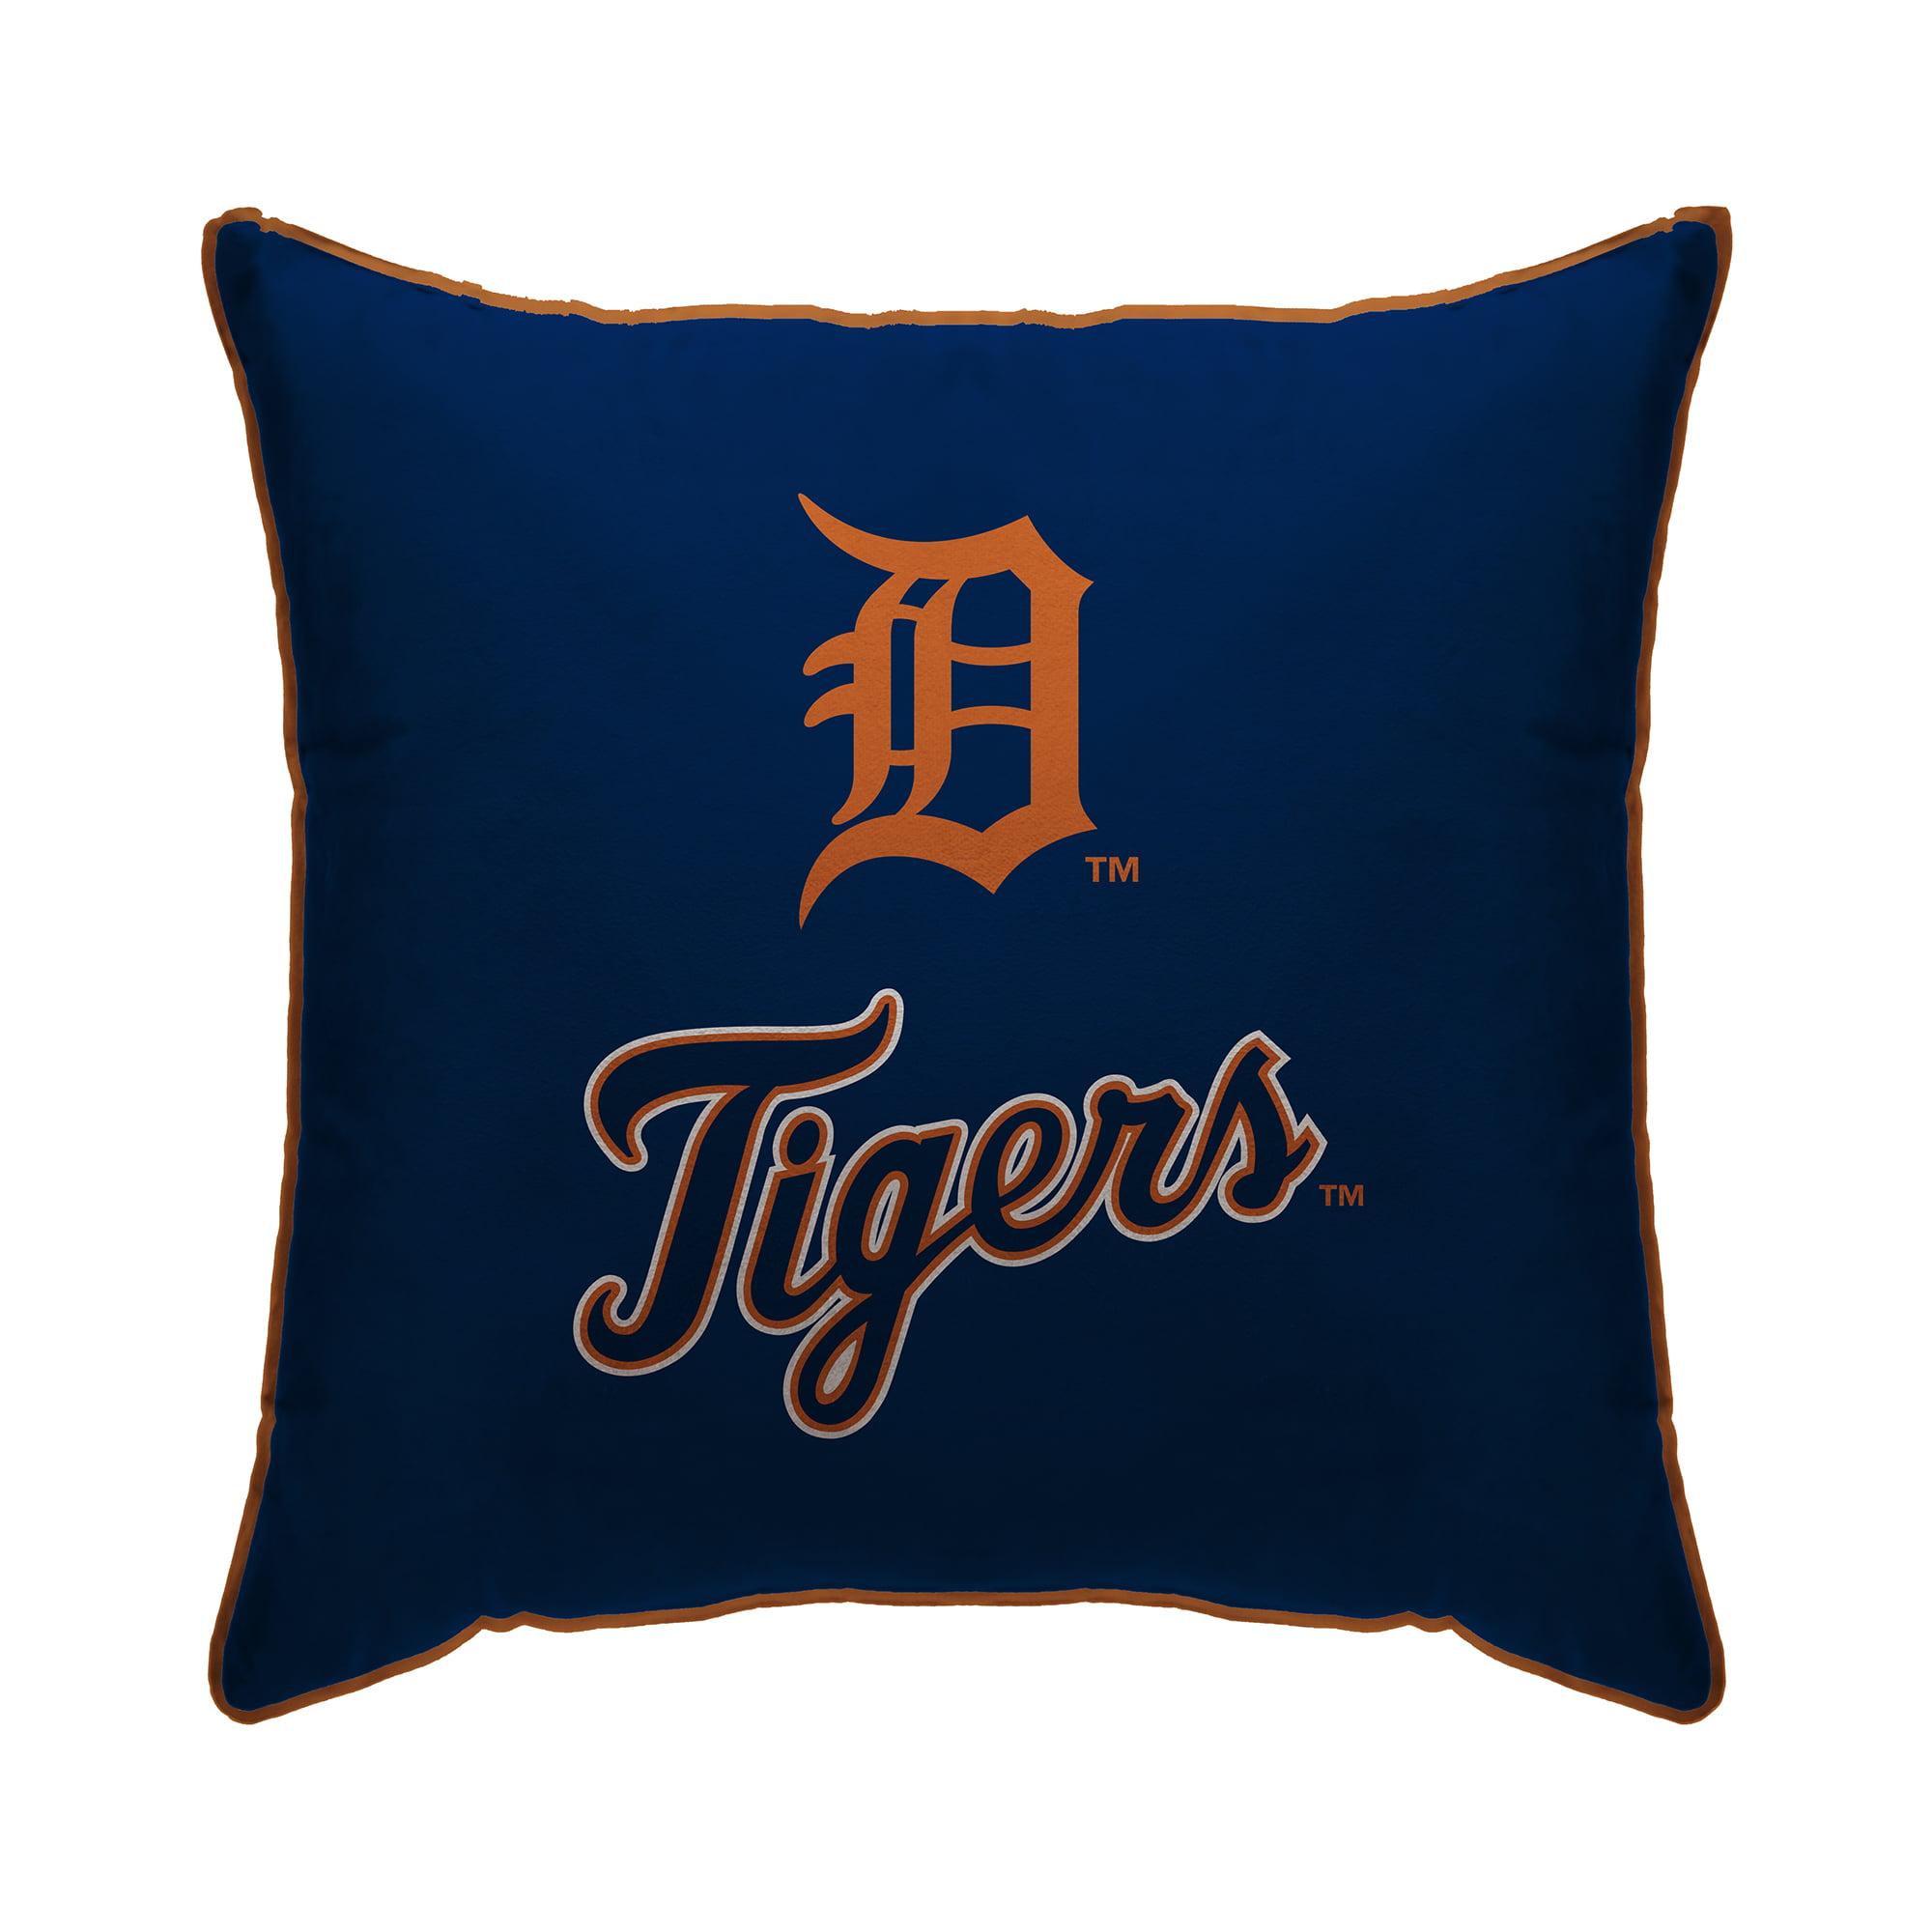 "Detroit Tigers 18"" x 18"" Plush Team Logo Decorative Throw Pillow - Blue - No Size"